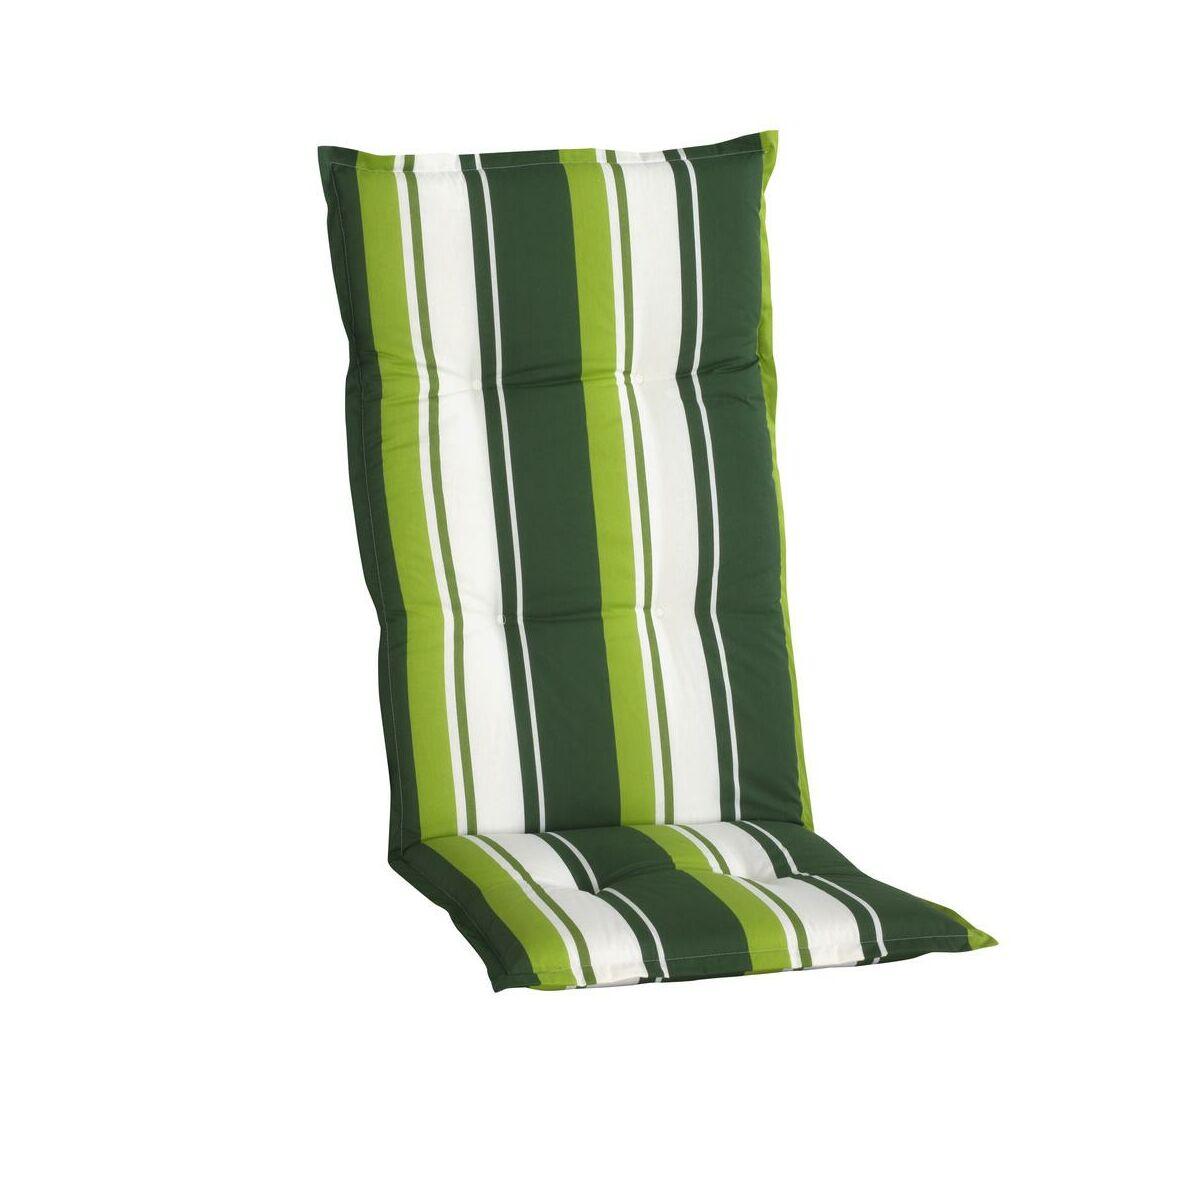 Poduszki Na Meble Ogrodowe Leroy Merlin : Fotel ogrodowy NAPOLI + Poduszka na meble ogrodowe SUN GARDEN  Serie